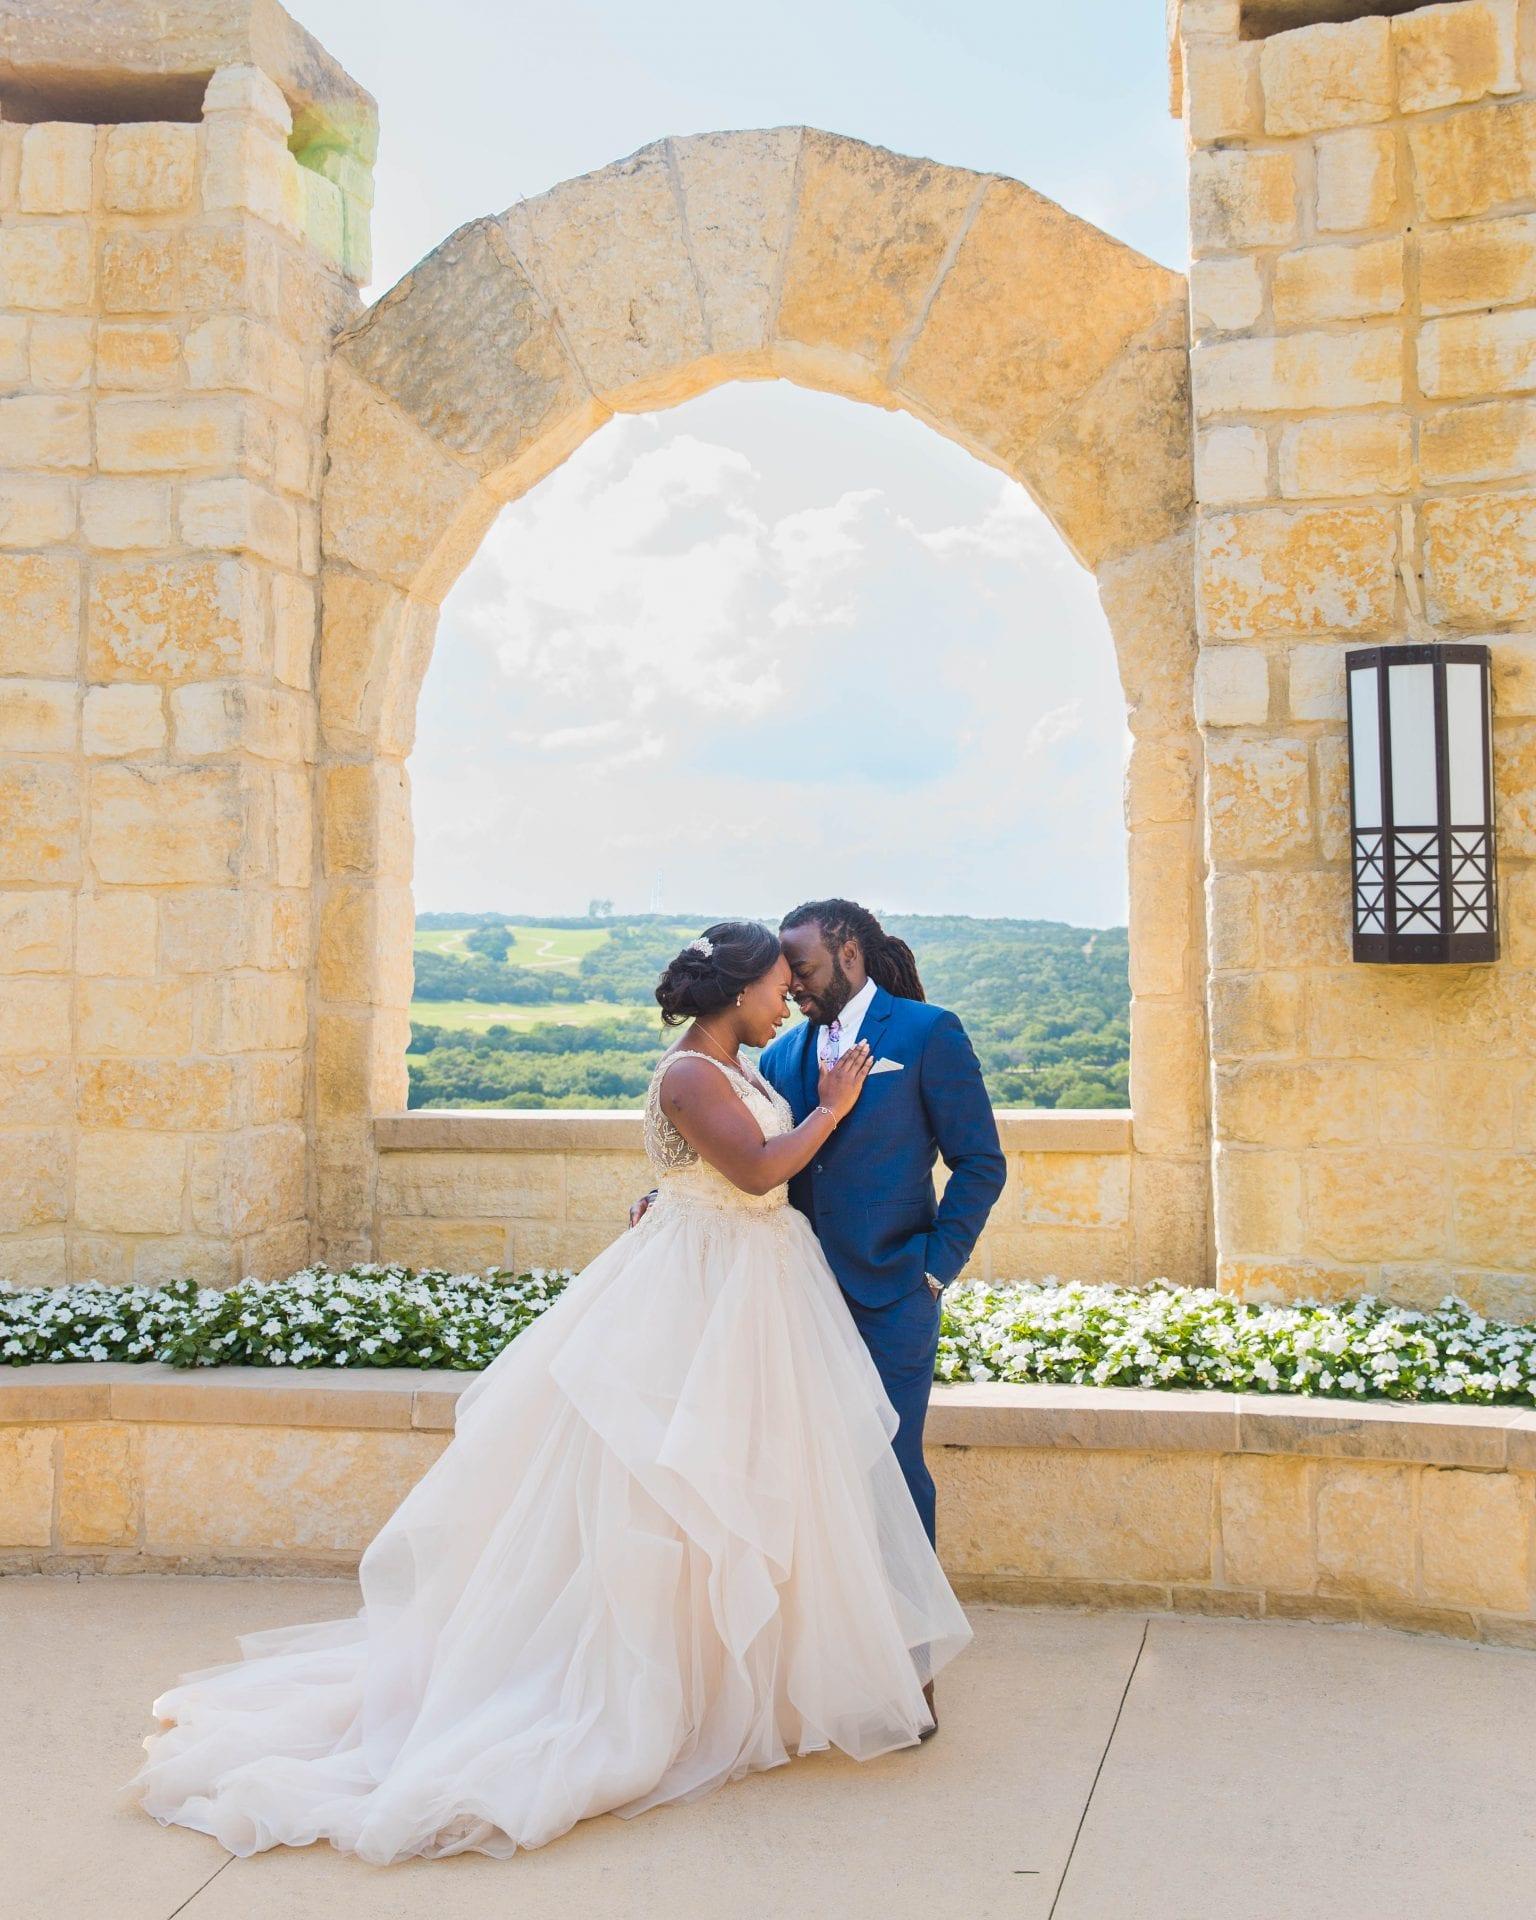 Onyema wedding La Cantera at the arches